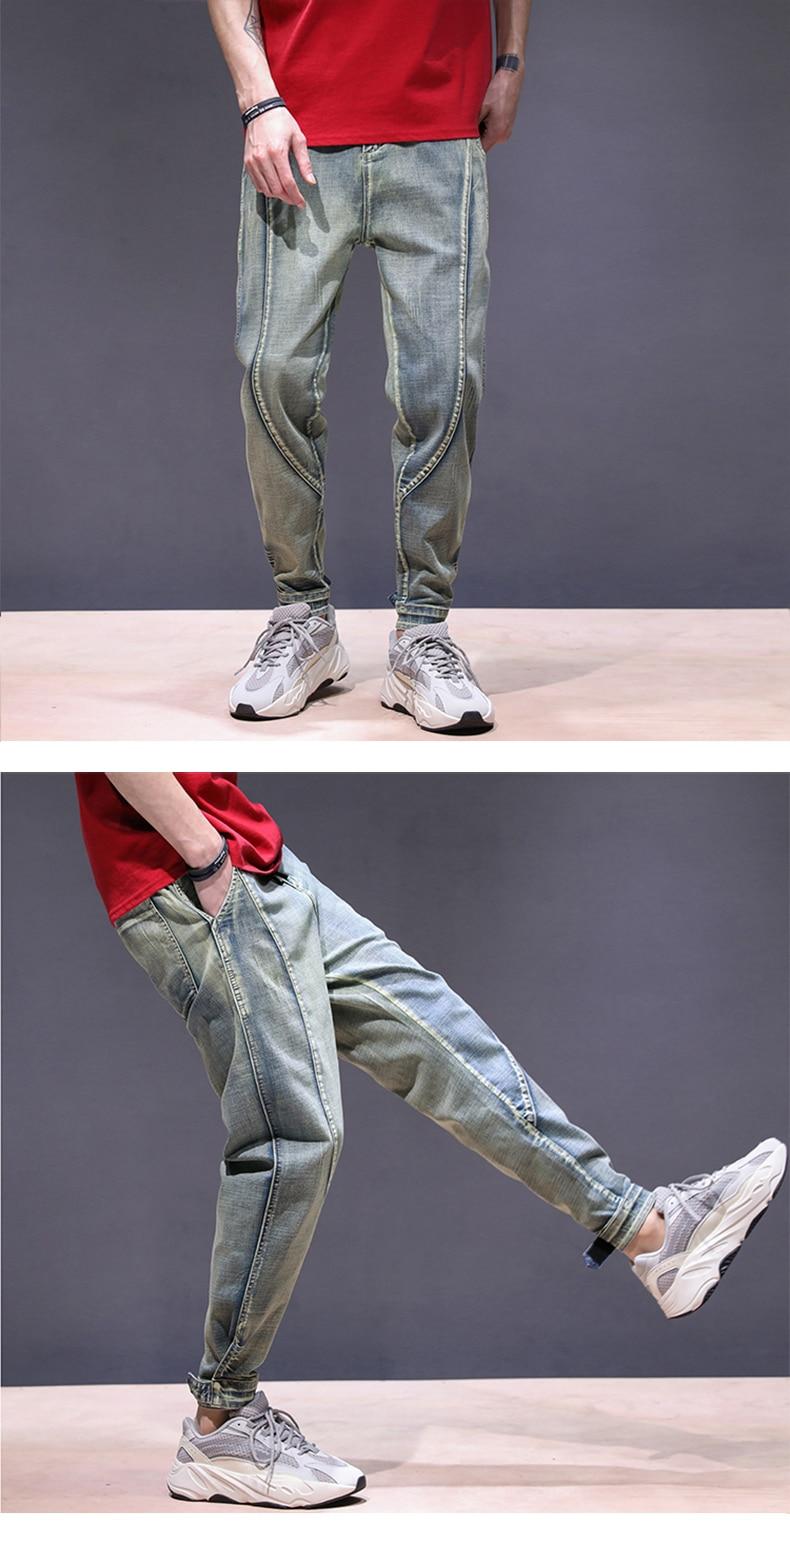 KSTUN Mens Jeans 2020 New Arrivals Retro Blue Elastic Waist Drawstring Baggy Legs Jogger Jeans Man Casaul Denim Pants Streetwear 13